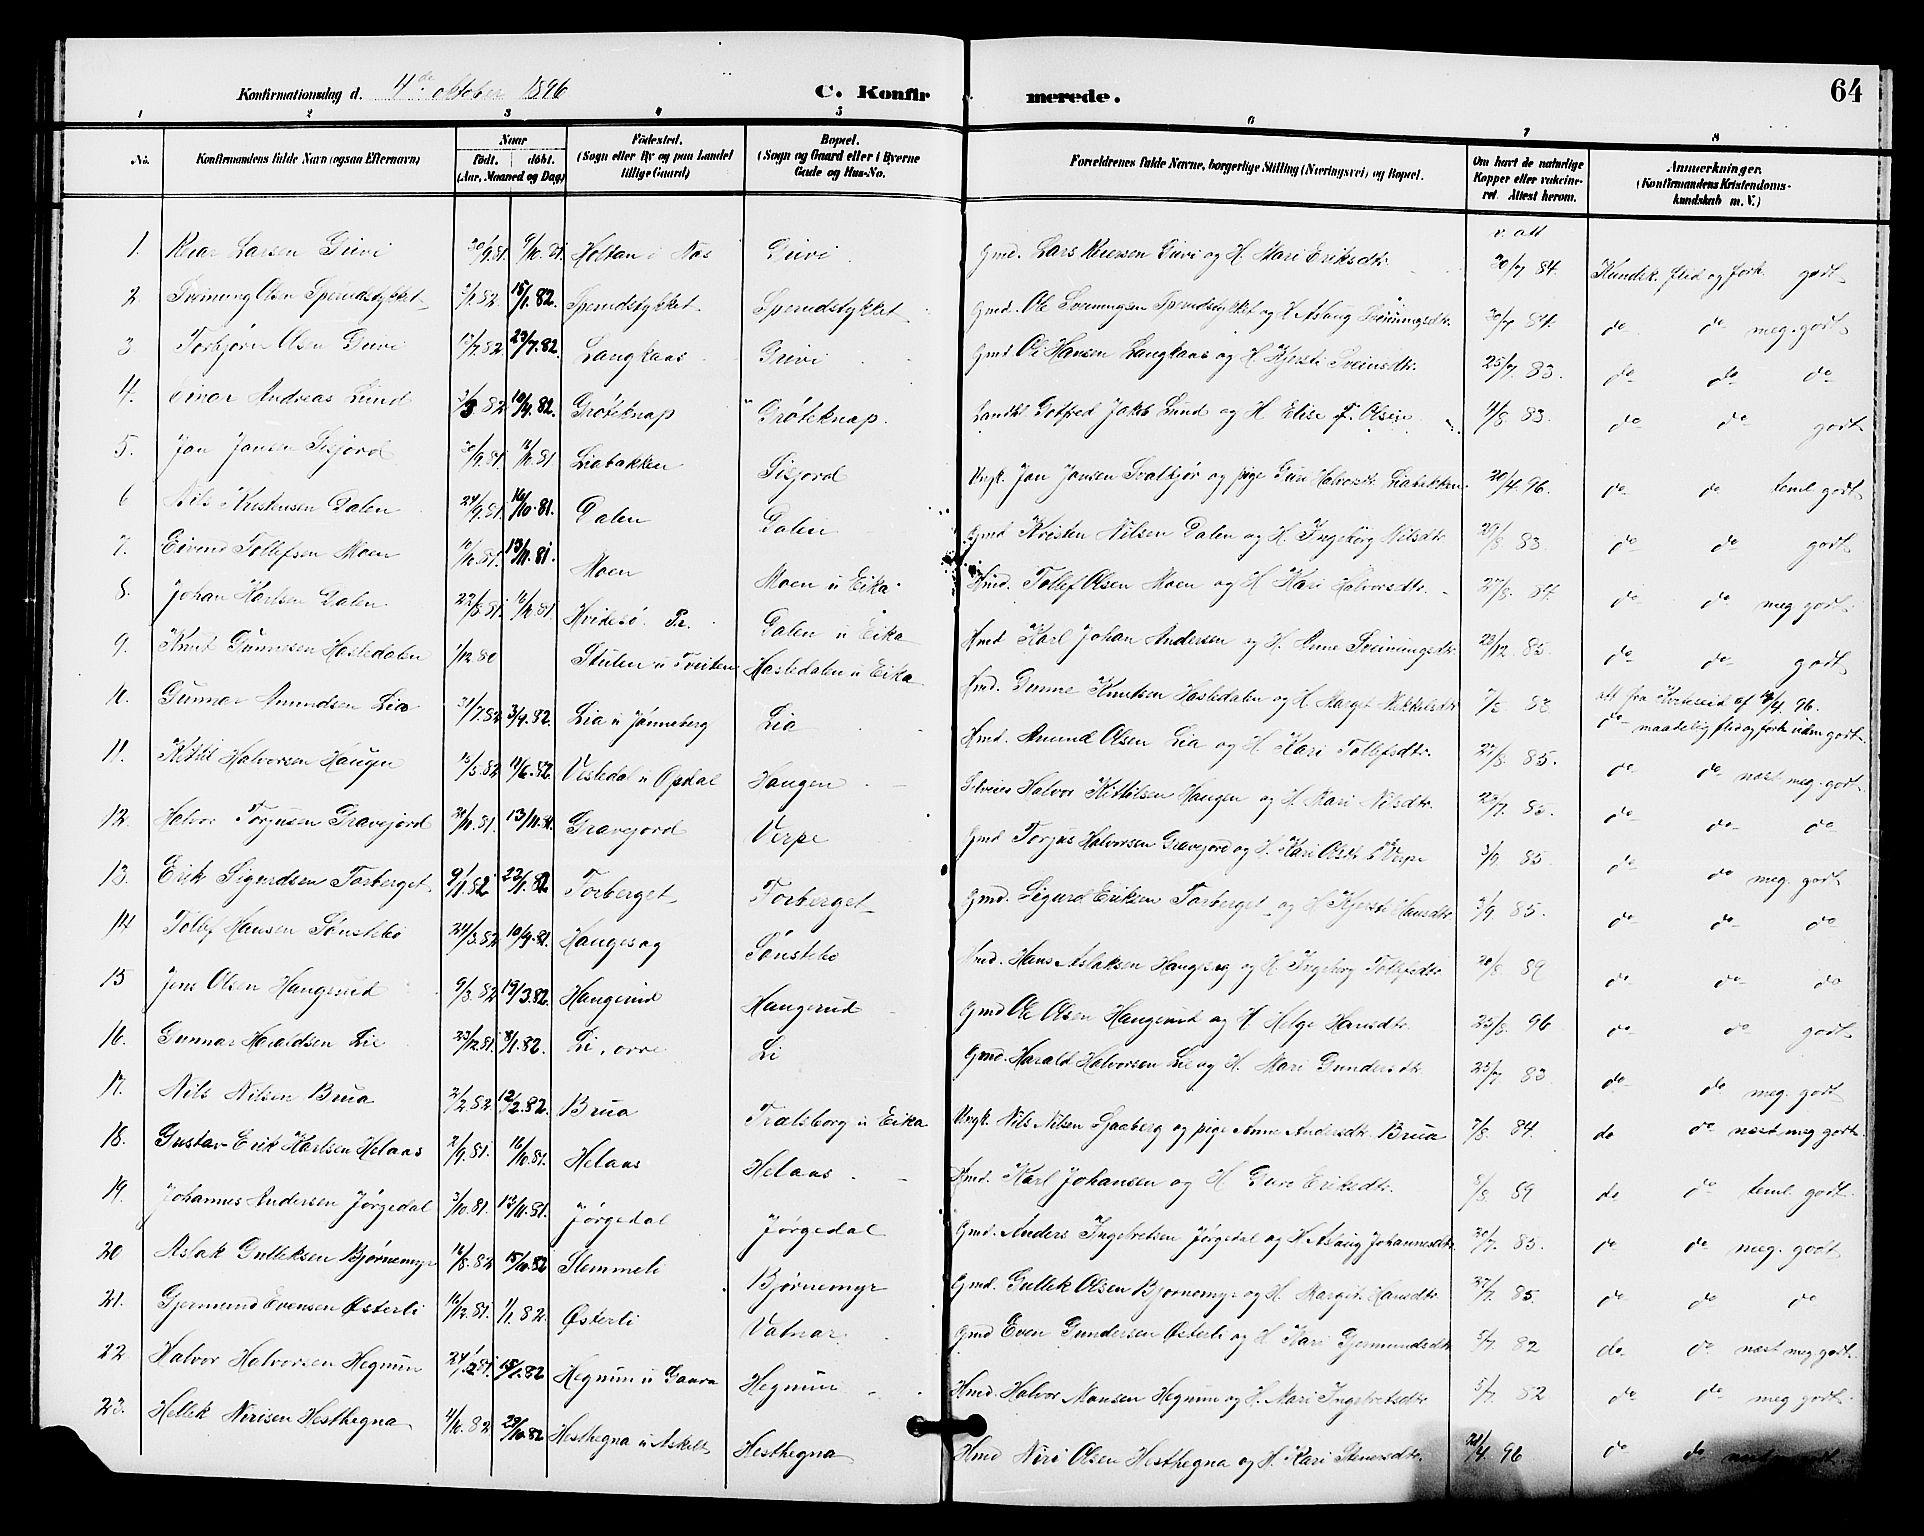 SAKO, Bø kirkebøker, G/Ga/L0006: Klokkerbok nr. 6, 1898-1909, s. 64